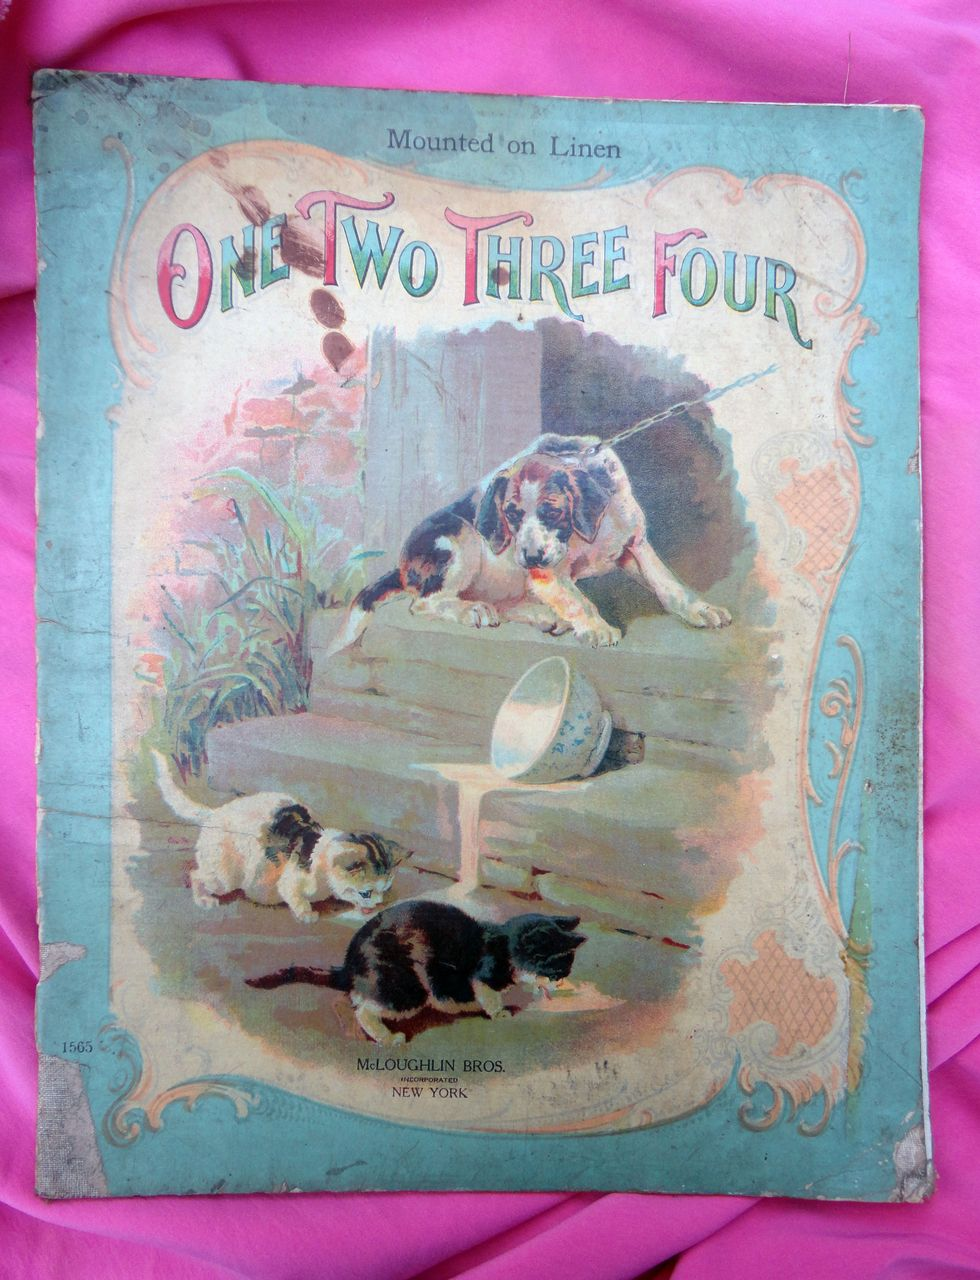 McLoughlin Bros. Chromolithograph Children's Book One Two Three Four